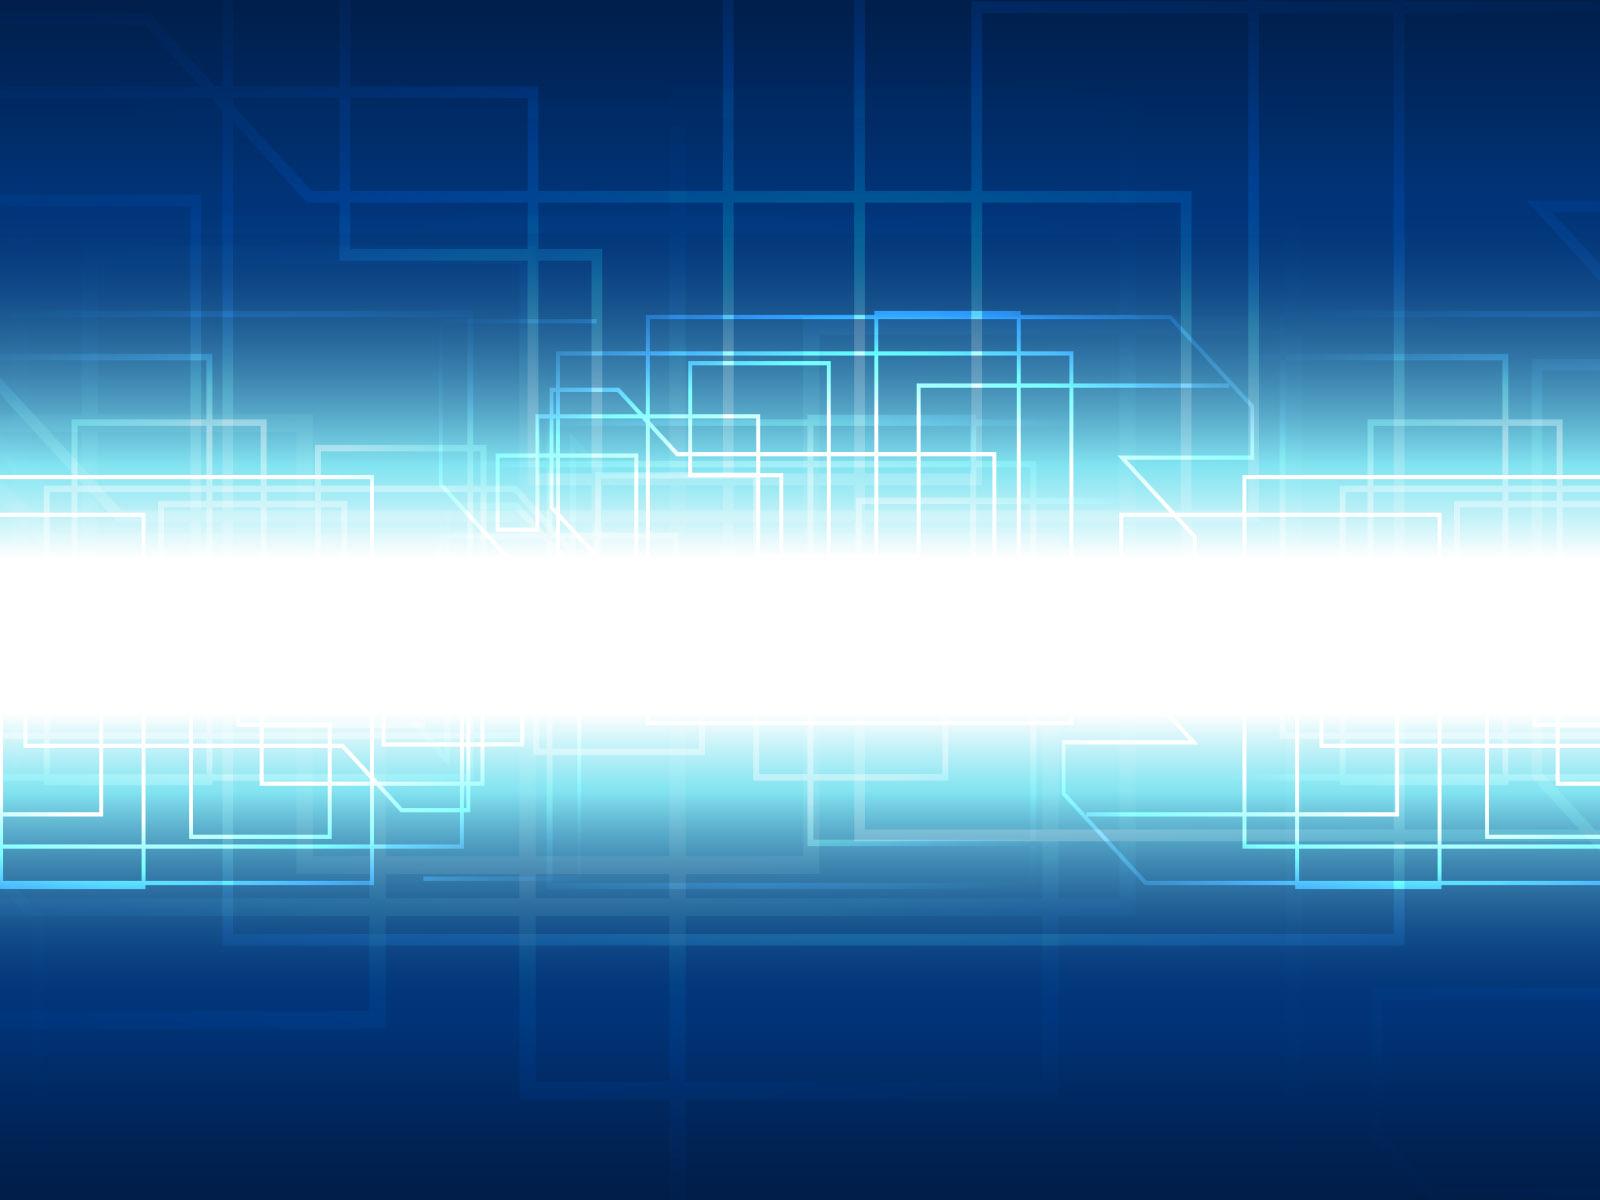 Computer System Powerpoint Templates   Aqua Cyan Blue 1600x1200